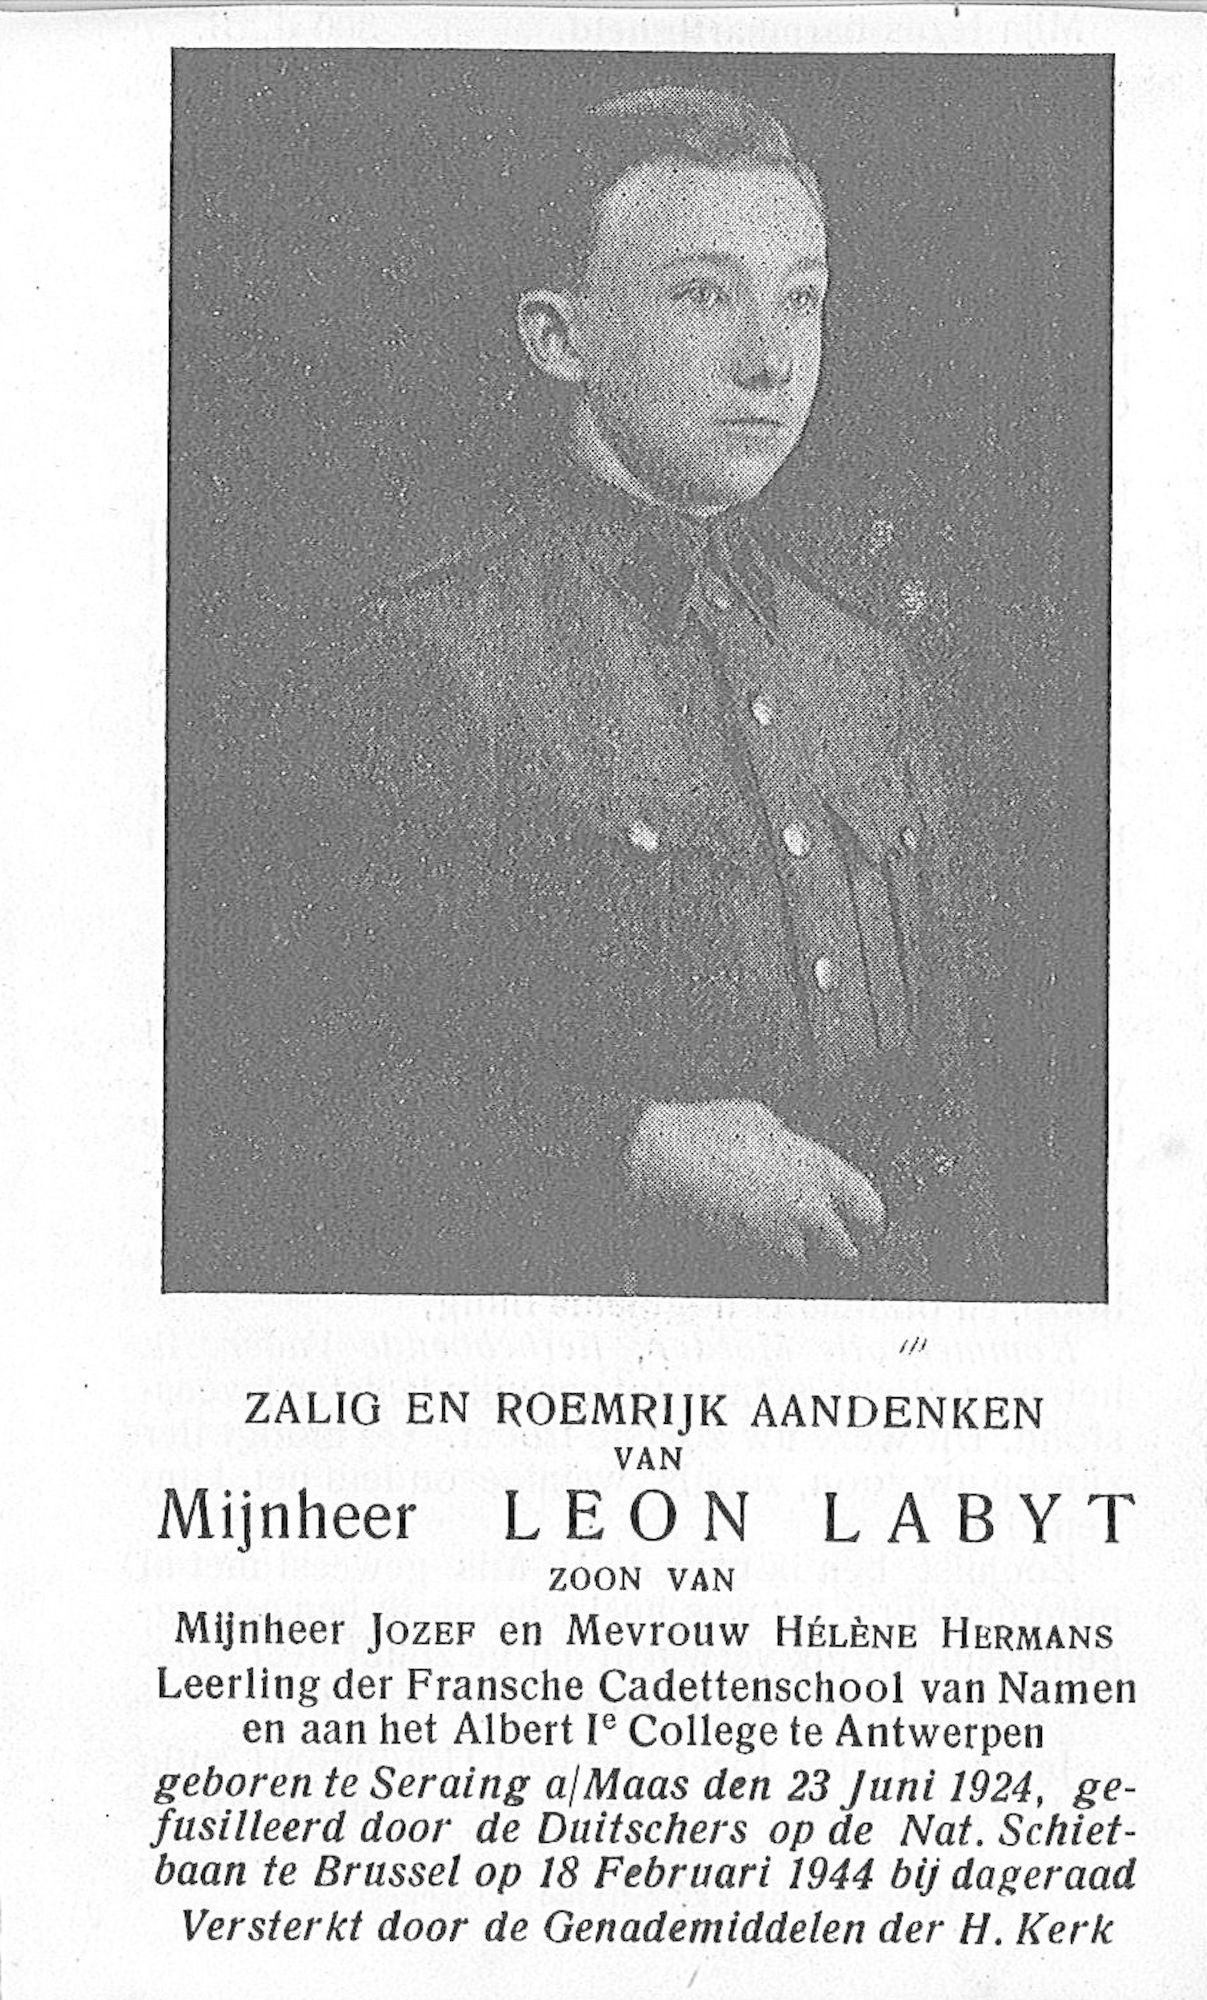 Leon Labyt